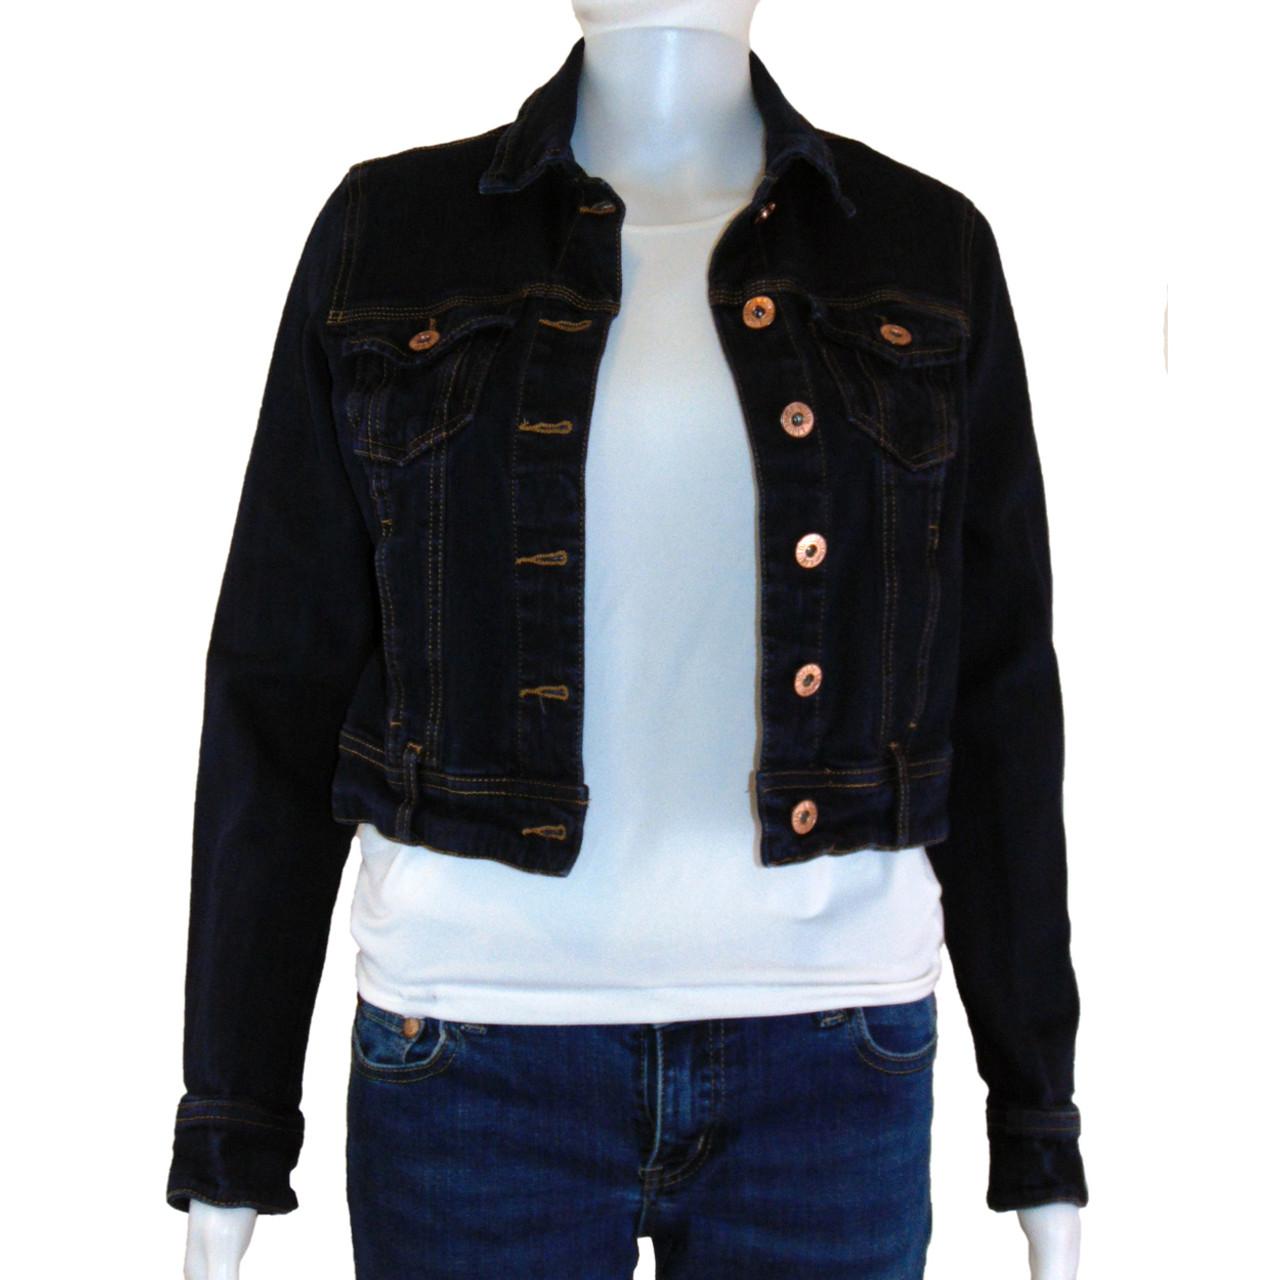 c40247b0a8a7 Liquidx Jeans Dark Denim - Brassy Button Down - 4 Pocket Jean Jacket